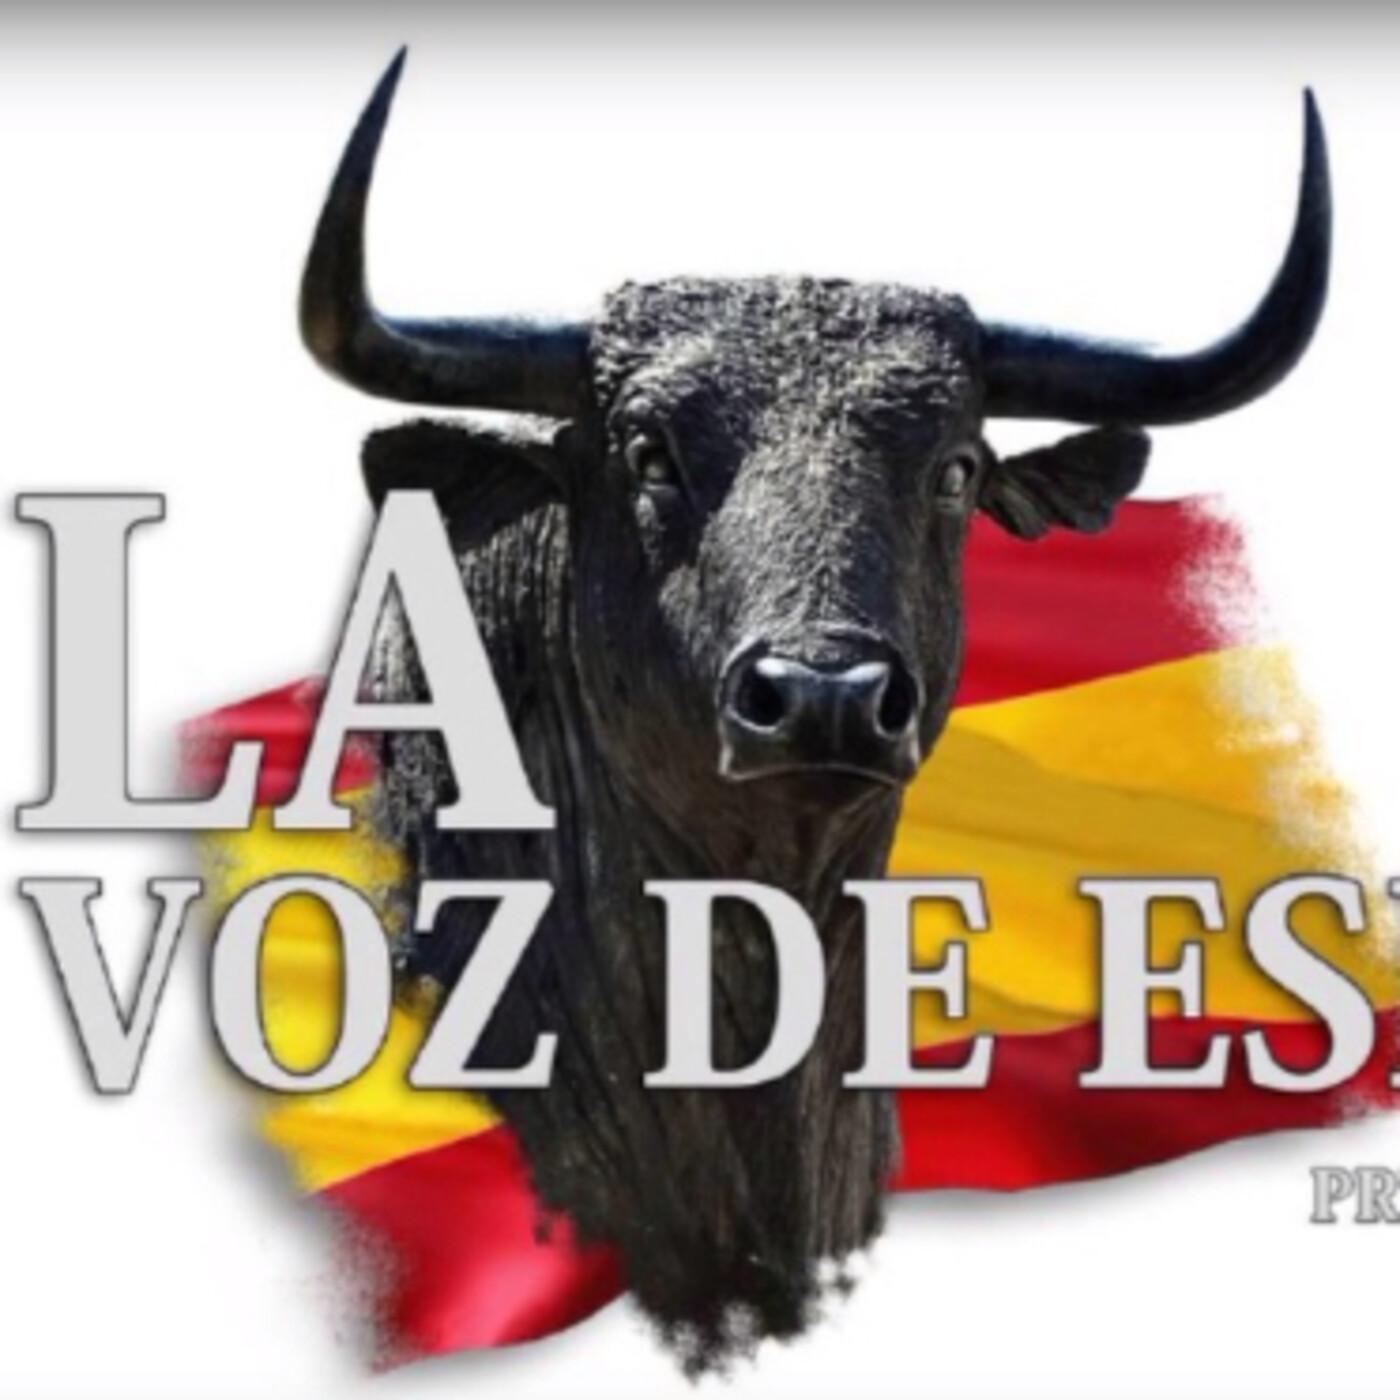 LA VOZ DE ESPAÑA Ed: 226 (10 de Mayo)